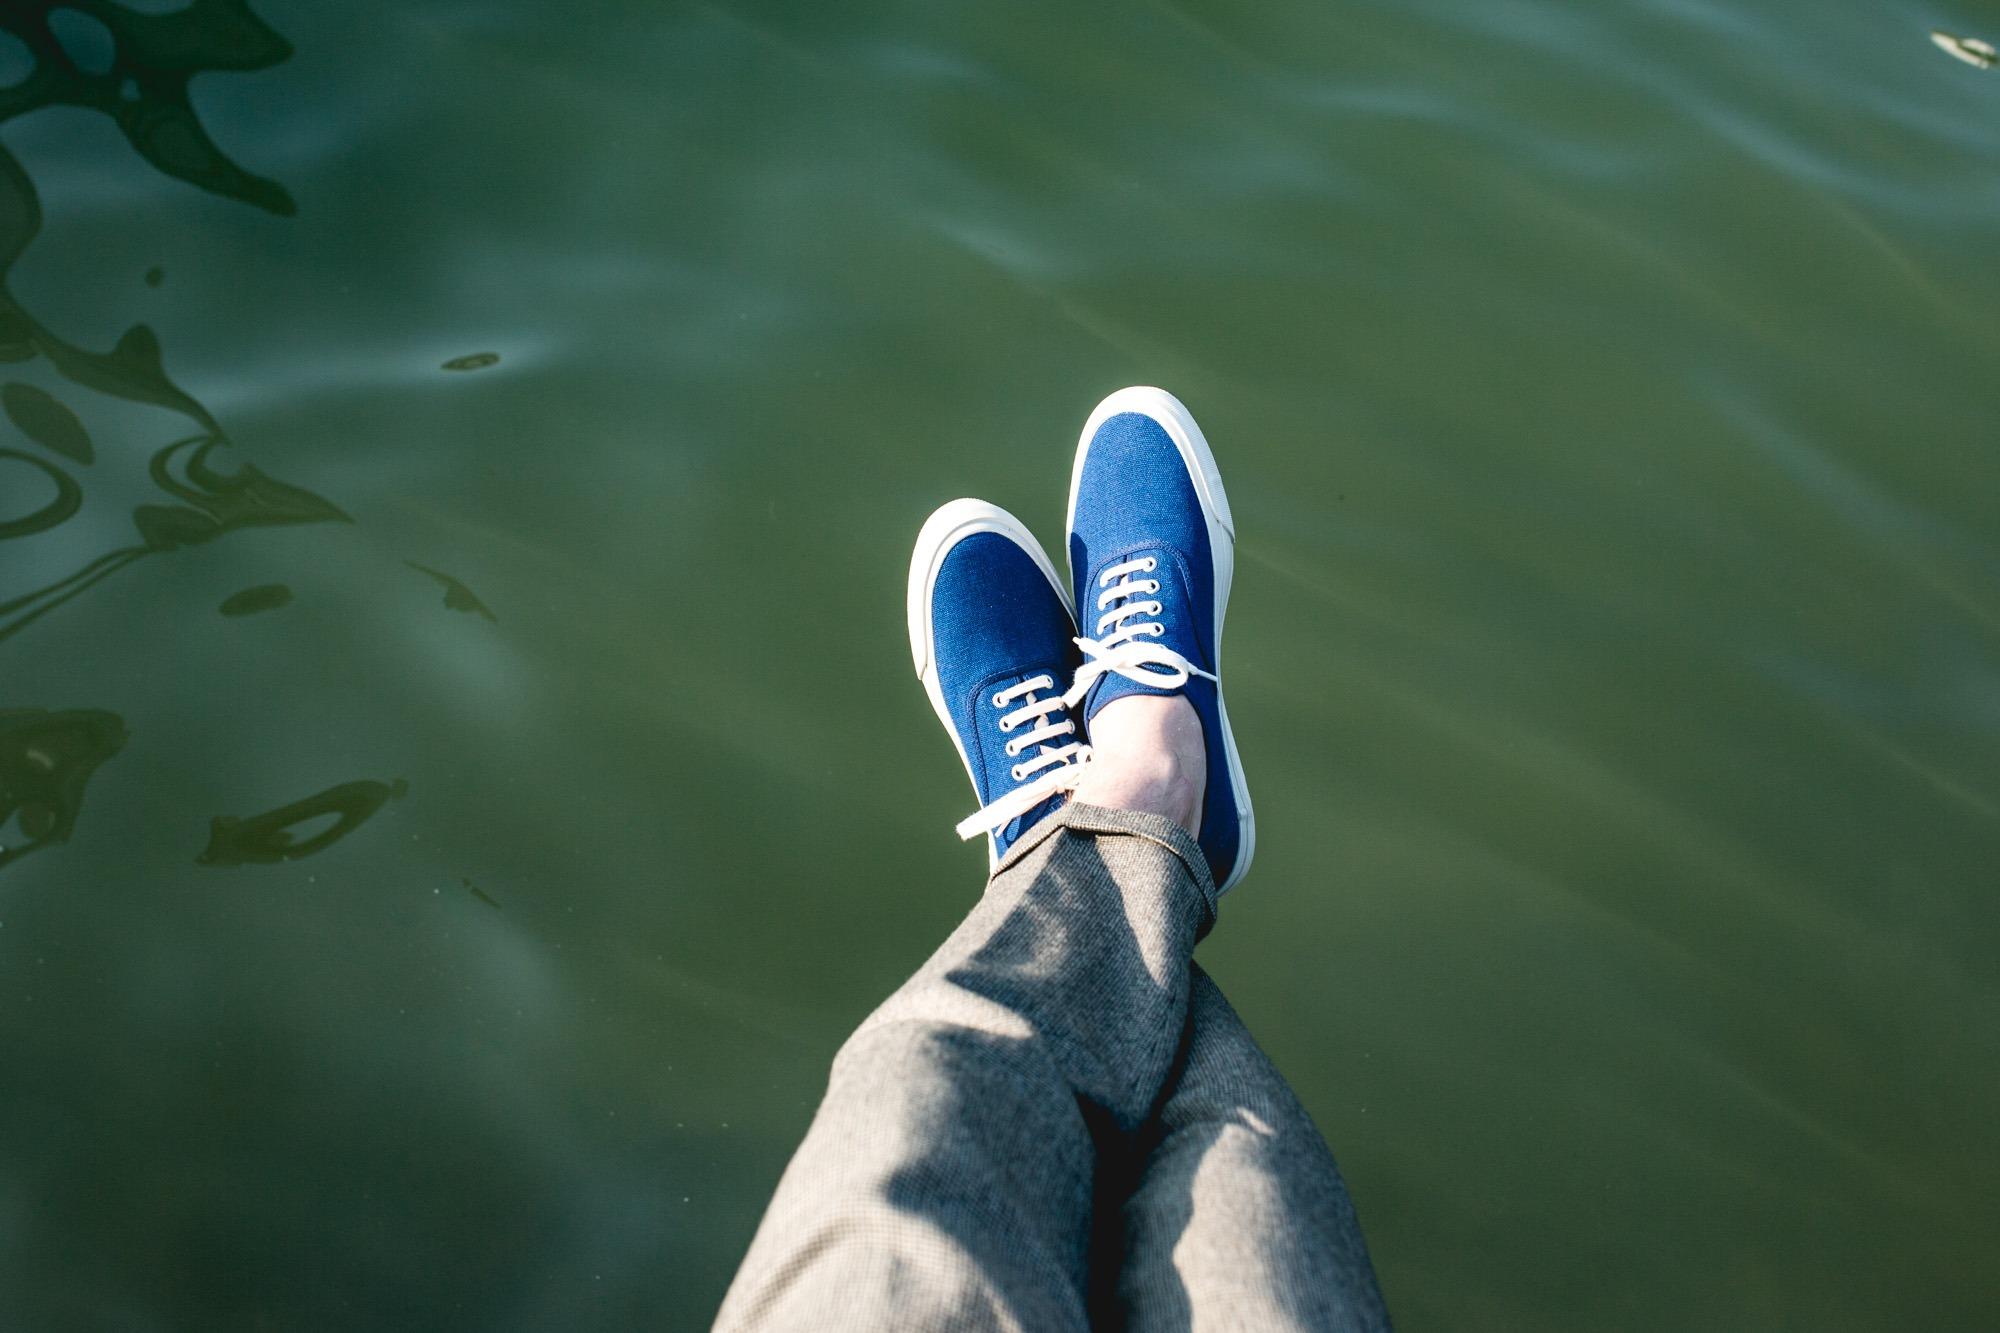 Doek Shoes Oxford Navy - Look